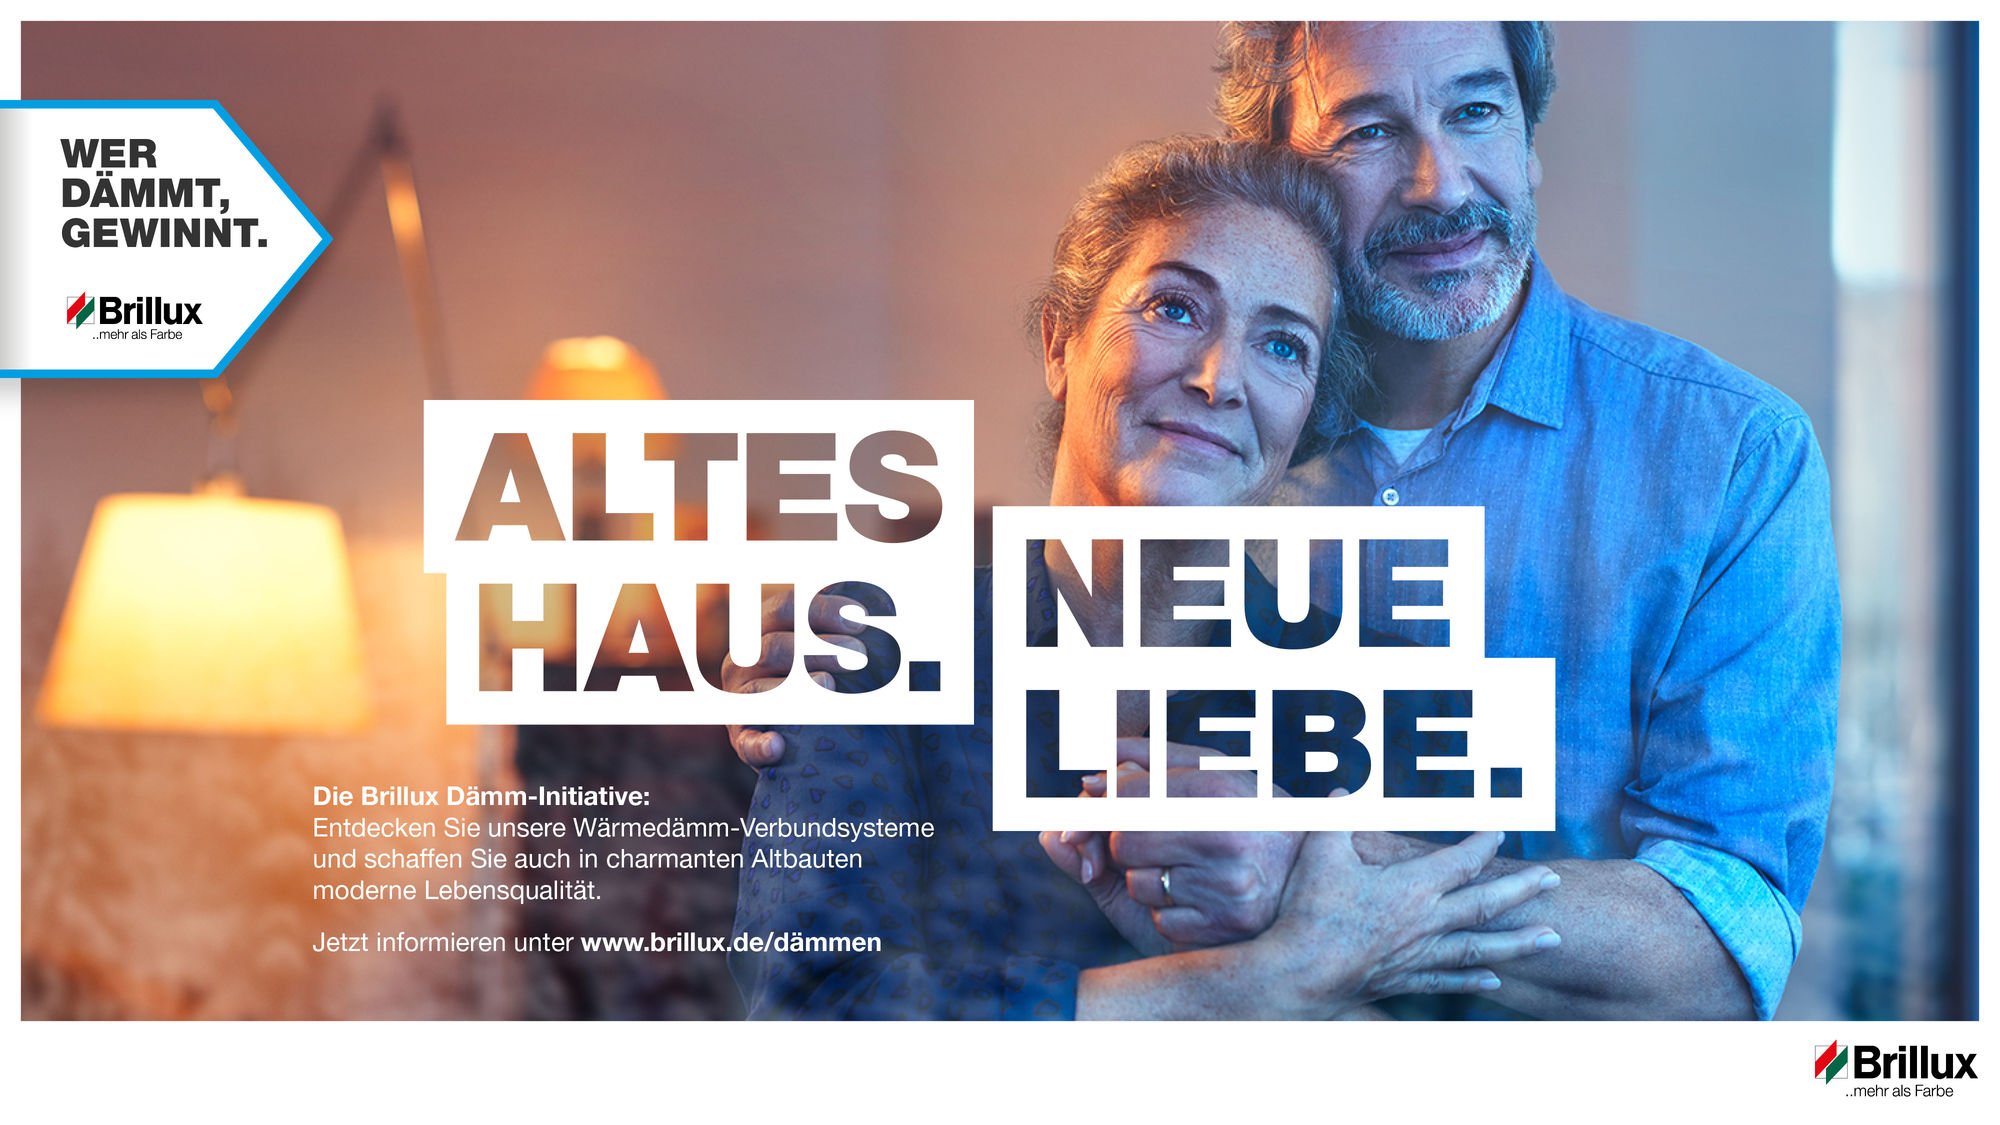 NEVEREST for Brillux GmbH & Co. KG